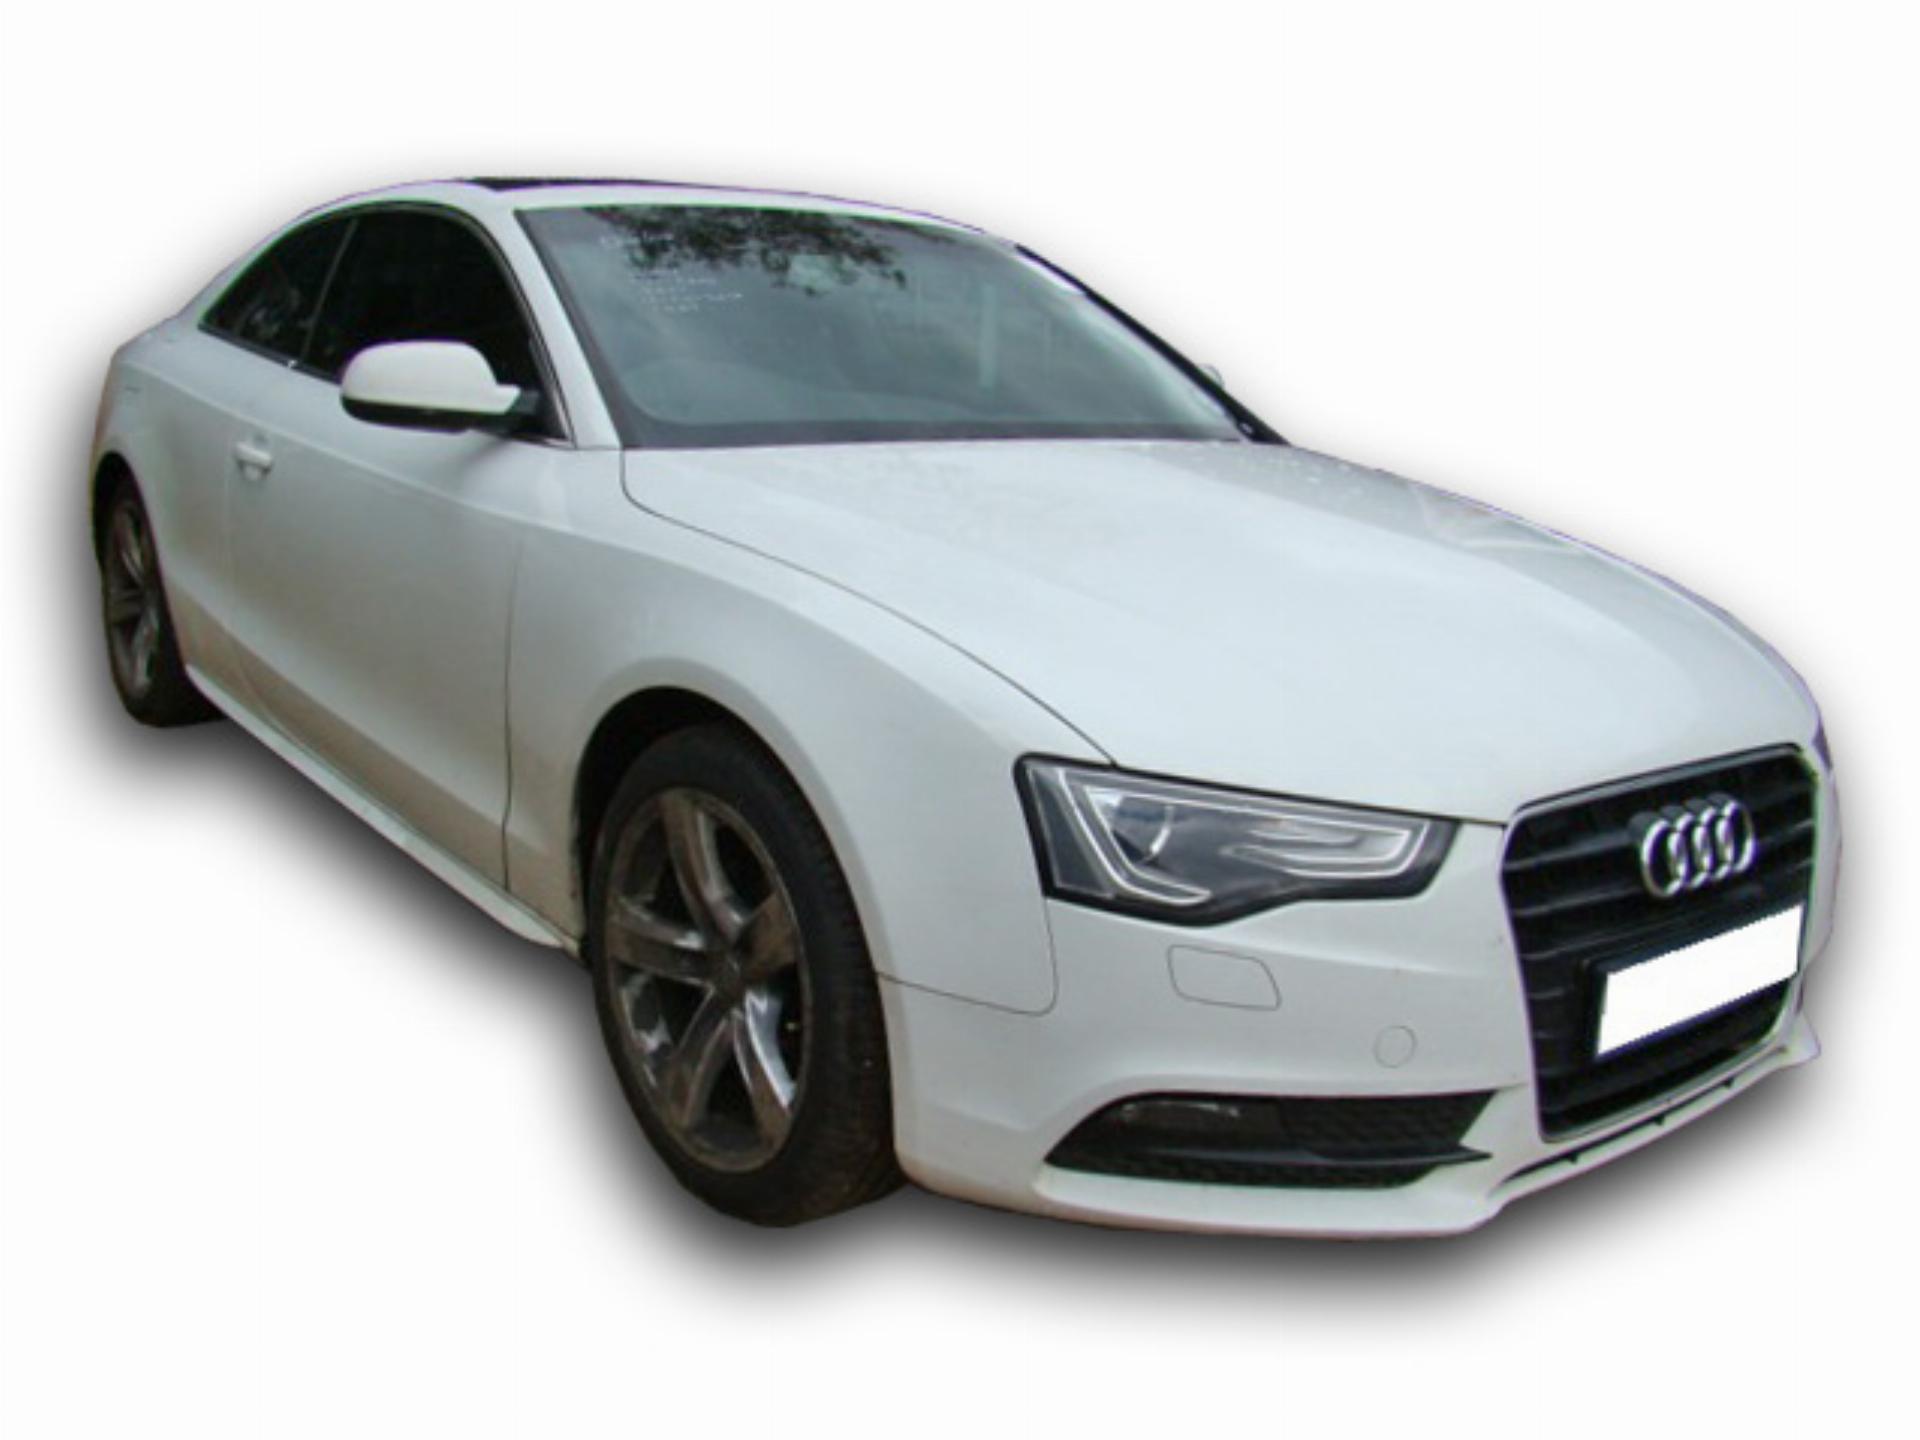 Audi A5 Sportback 2.0 TDI Multironic